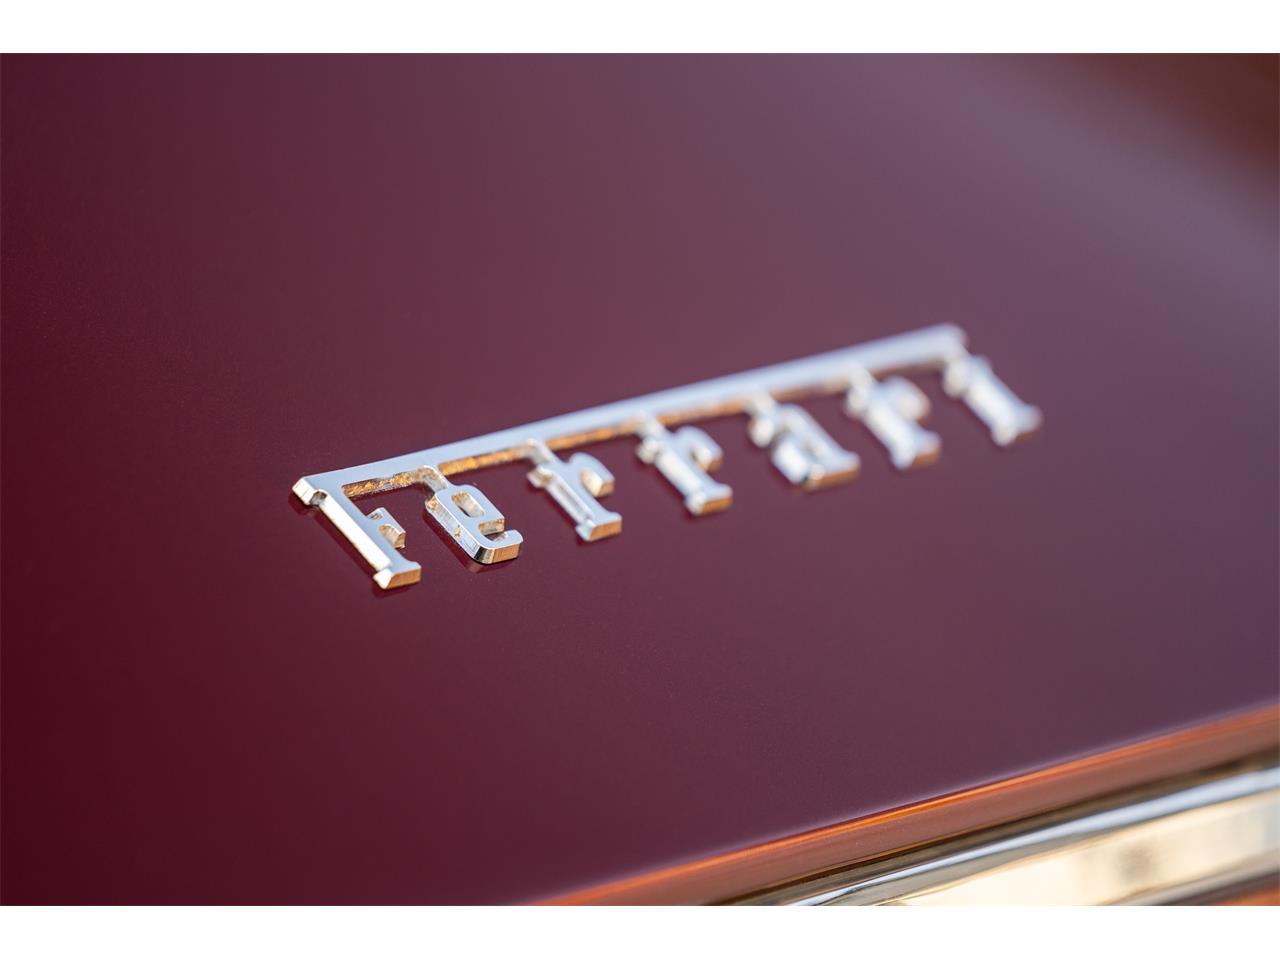 Large Picture of Classic 1972 Ferrari 365 GTB/4 Daytona - $725,000.00 - QL32